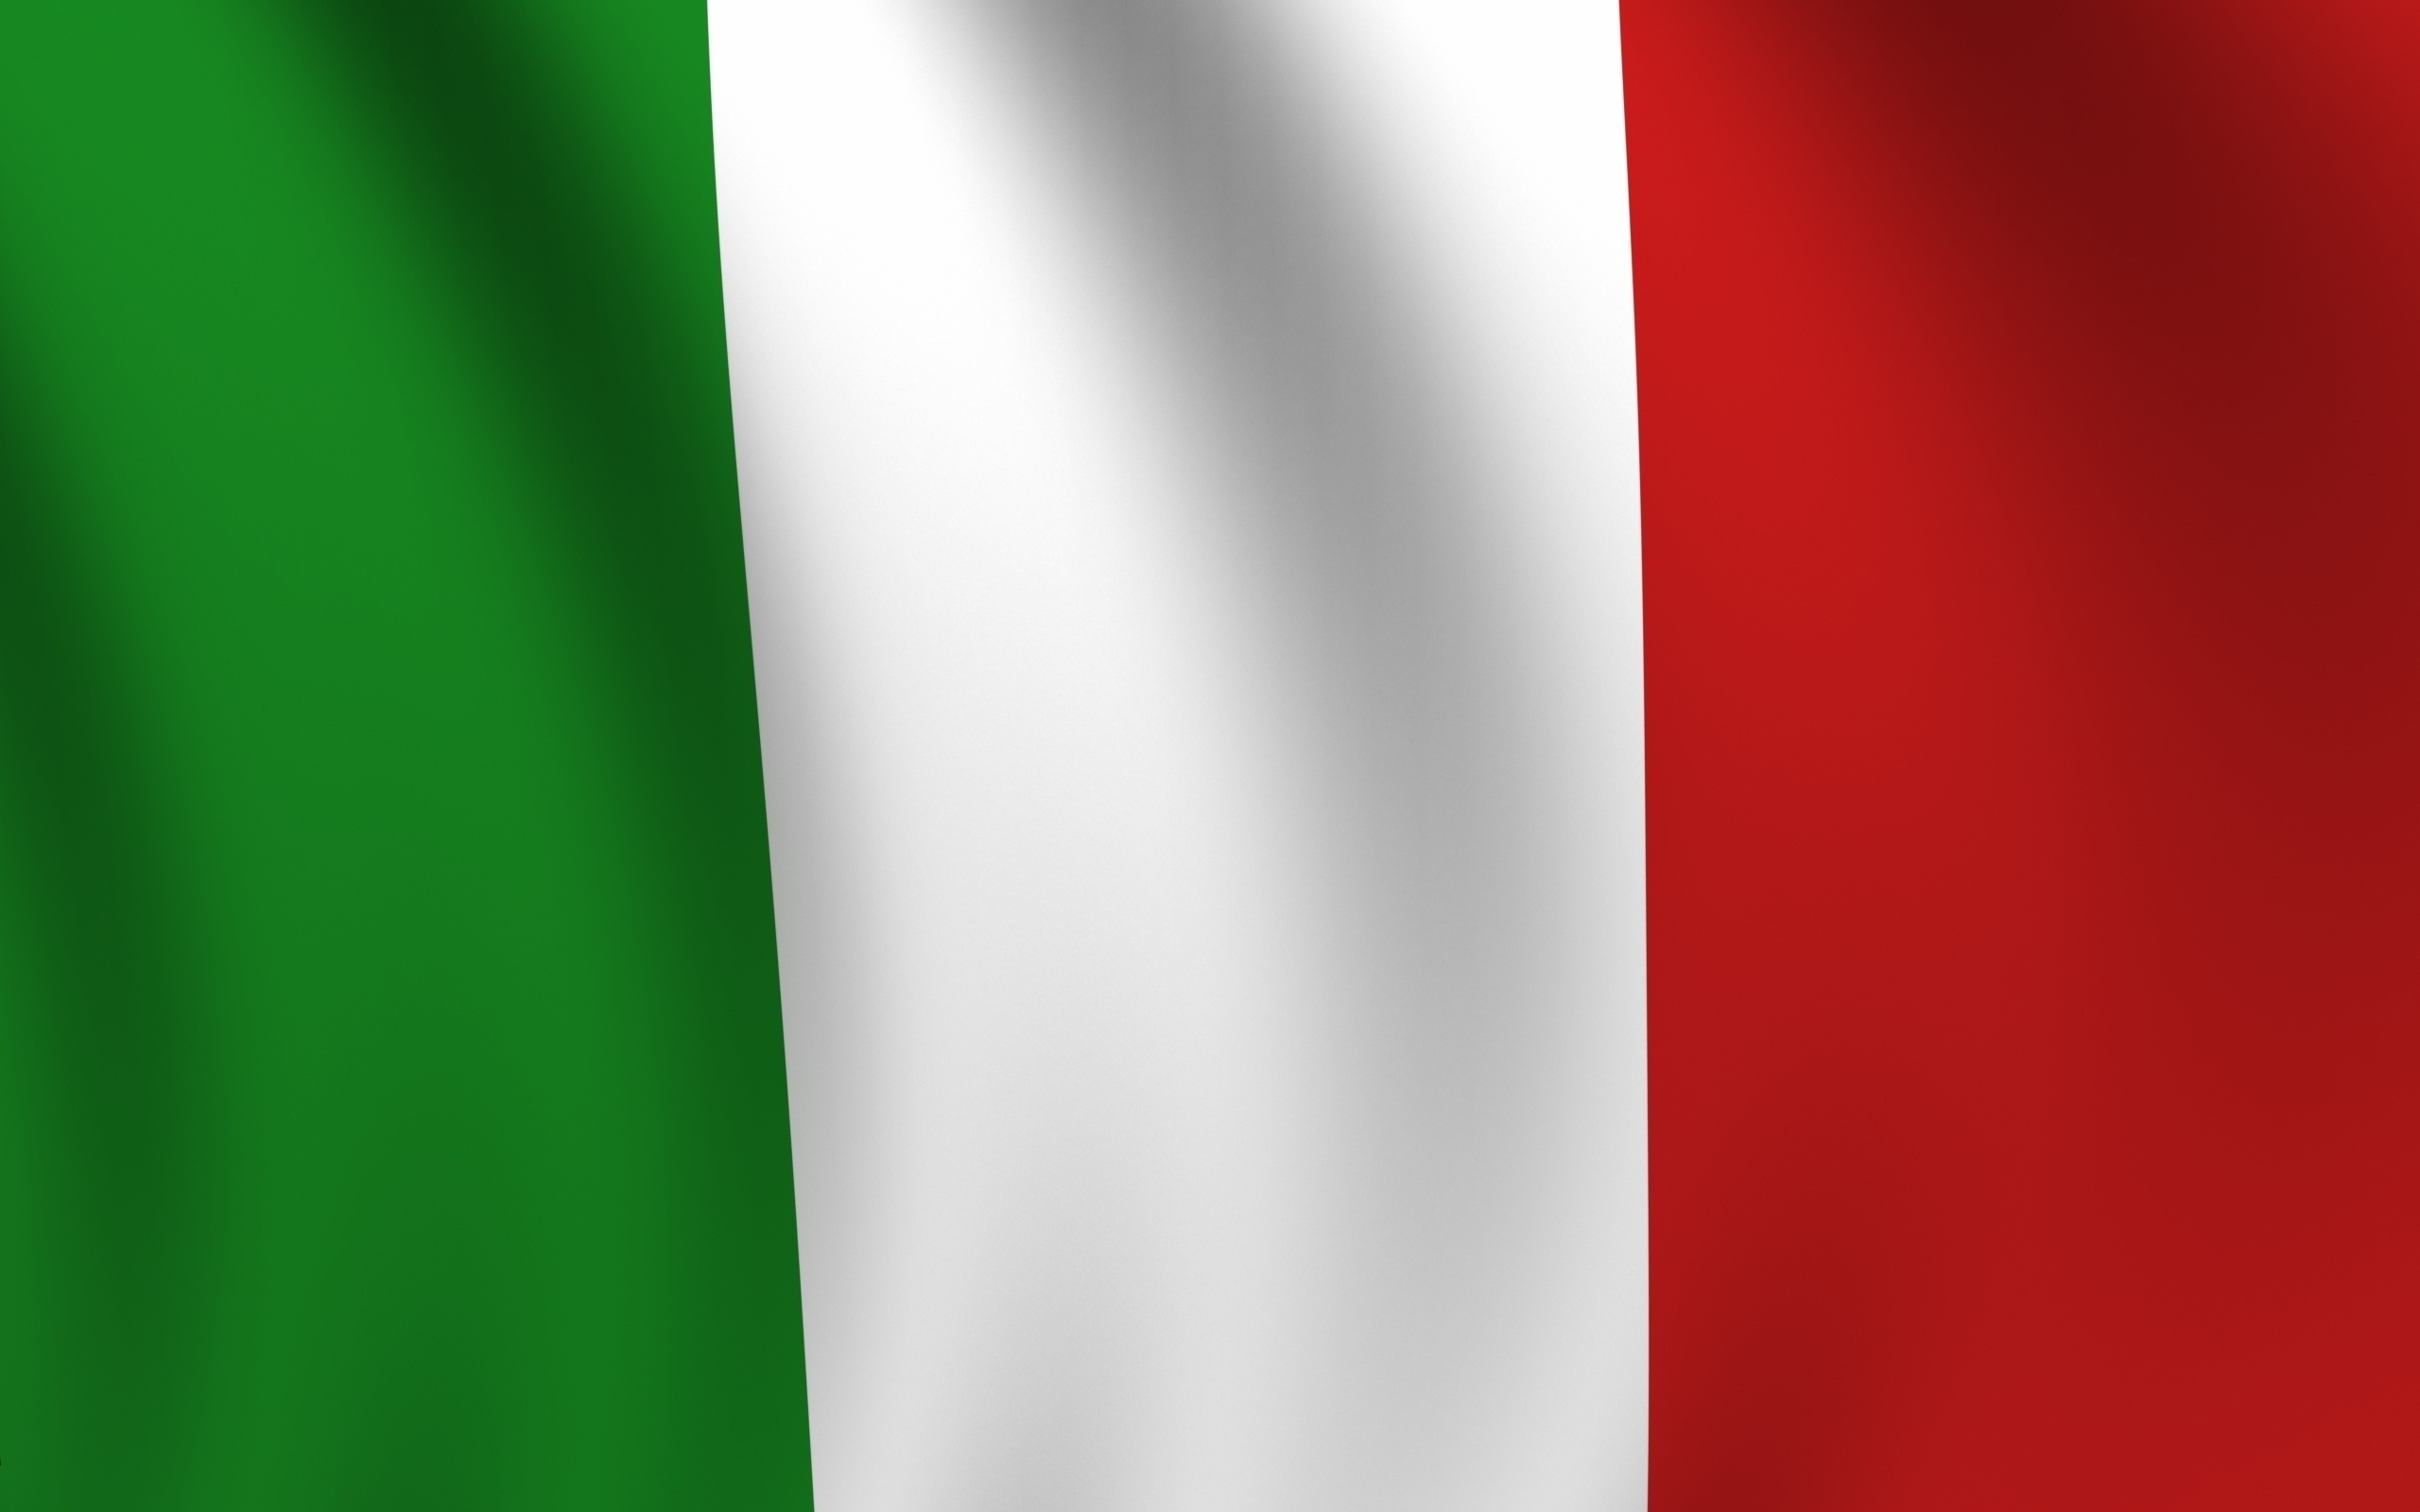 Italy Flag Wallpaper 46738 2560x1600 px ~ HDWallSource.com